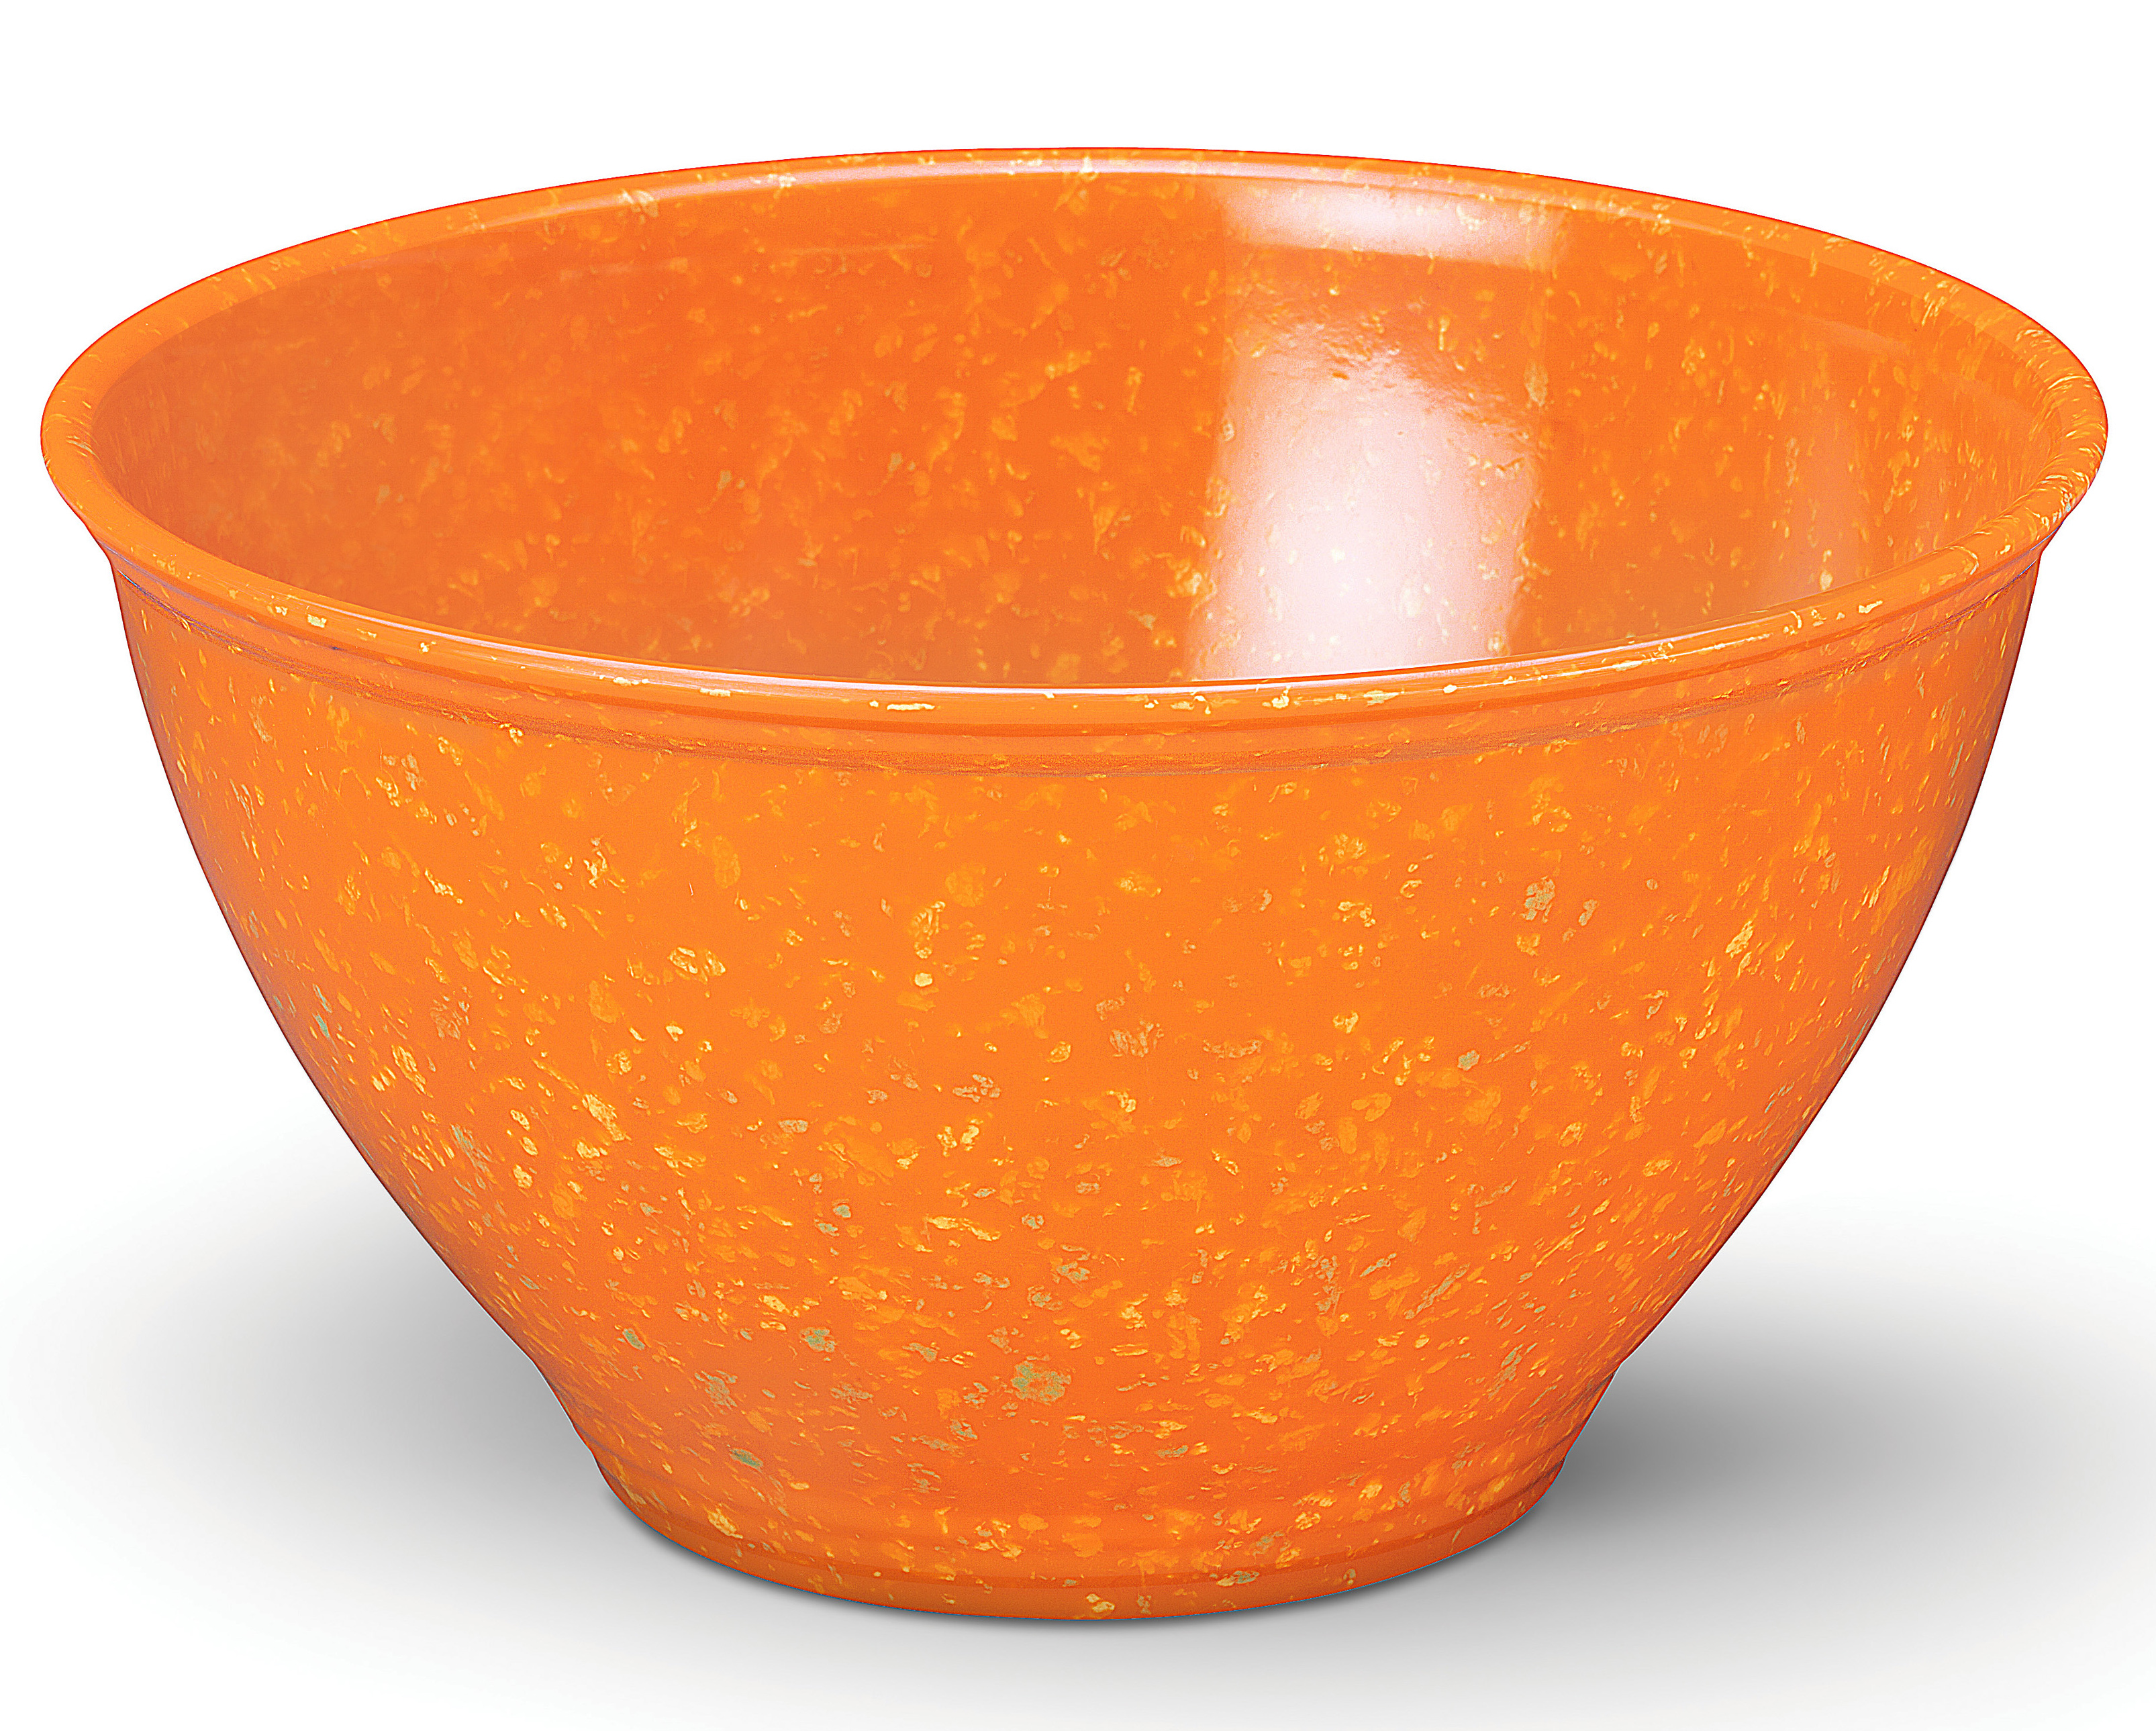 Rachael Ray Orange Footed Garbage Bowl